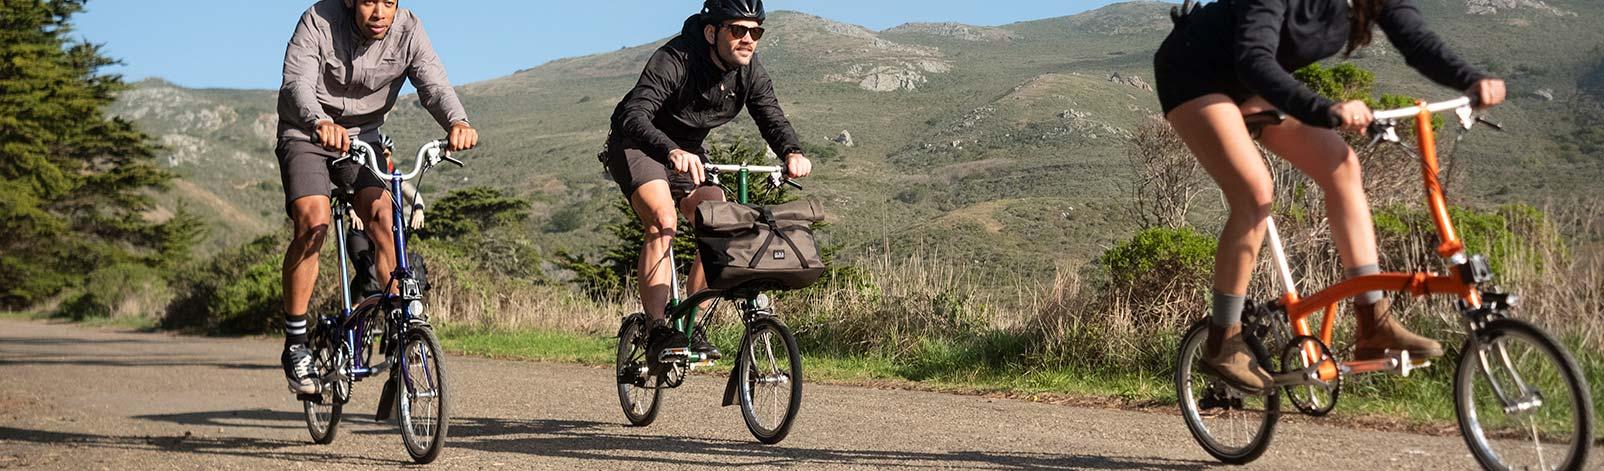 Brompton Bicycle Register Your Bike